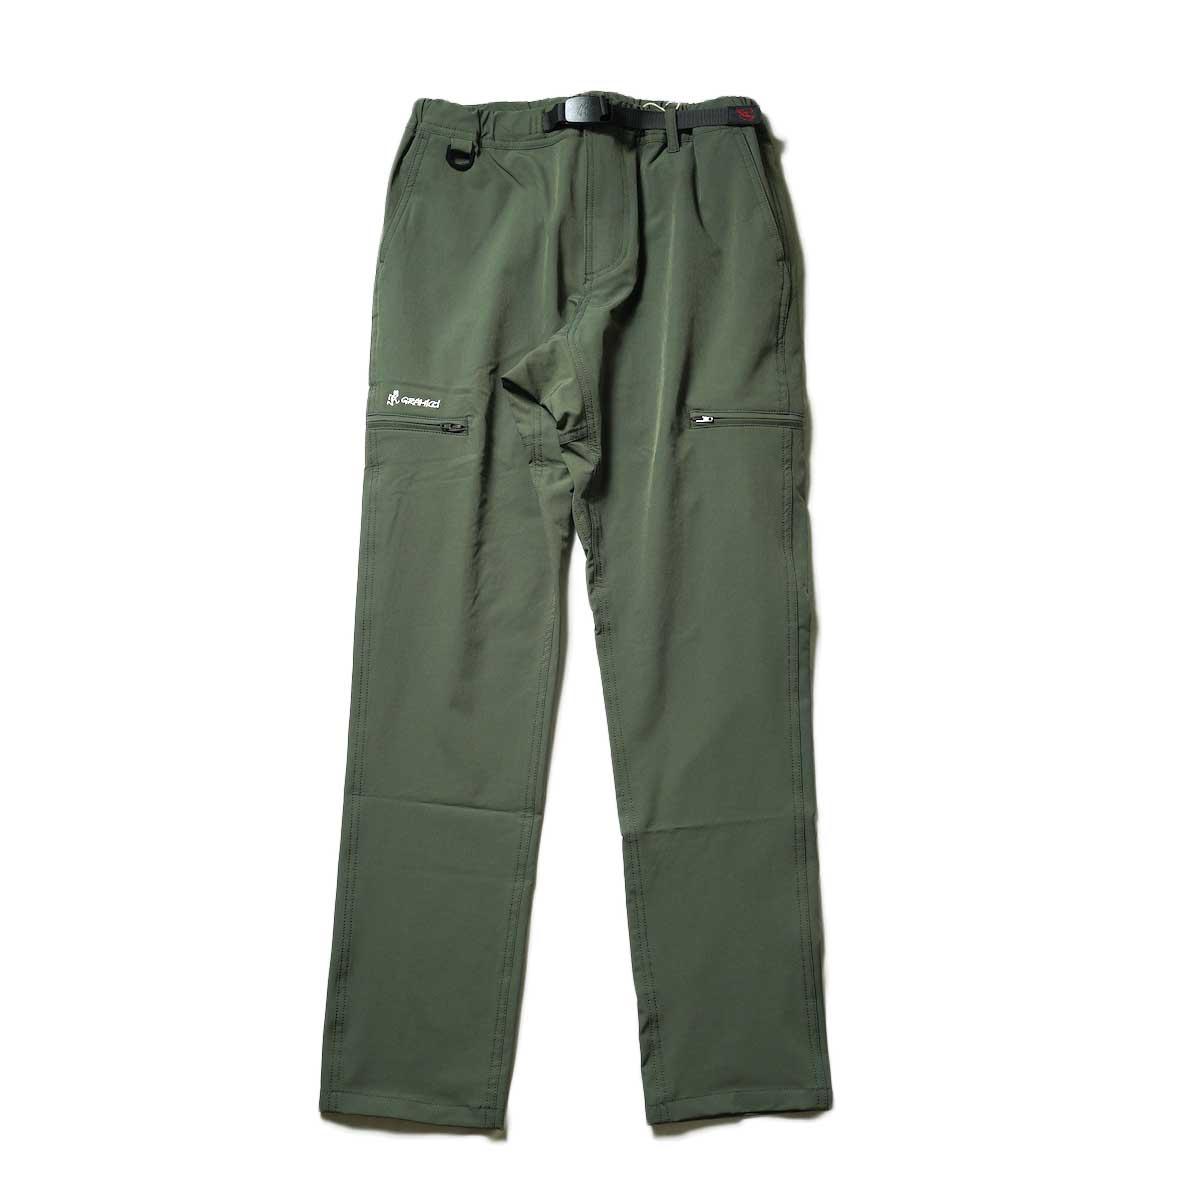 GRAMICCI / 4-WAY STRETCH GEAR TIGHT FIT PANTS (Olive)